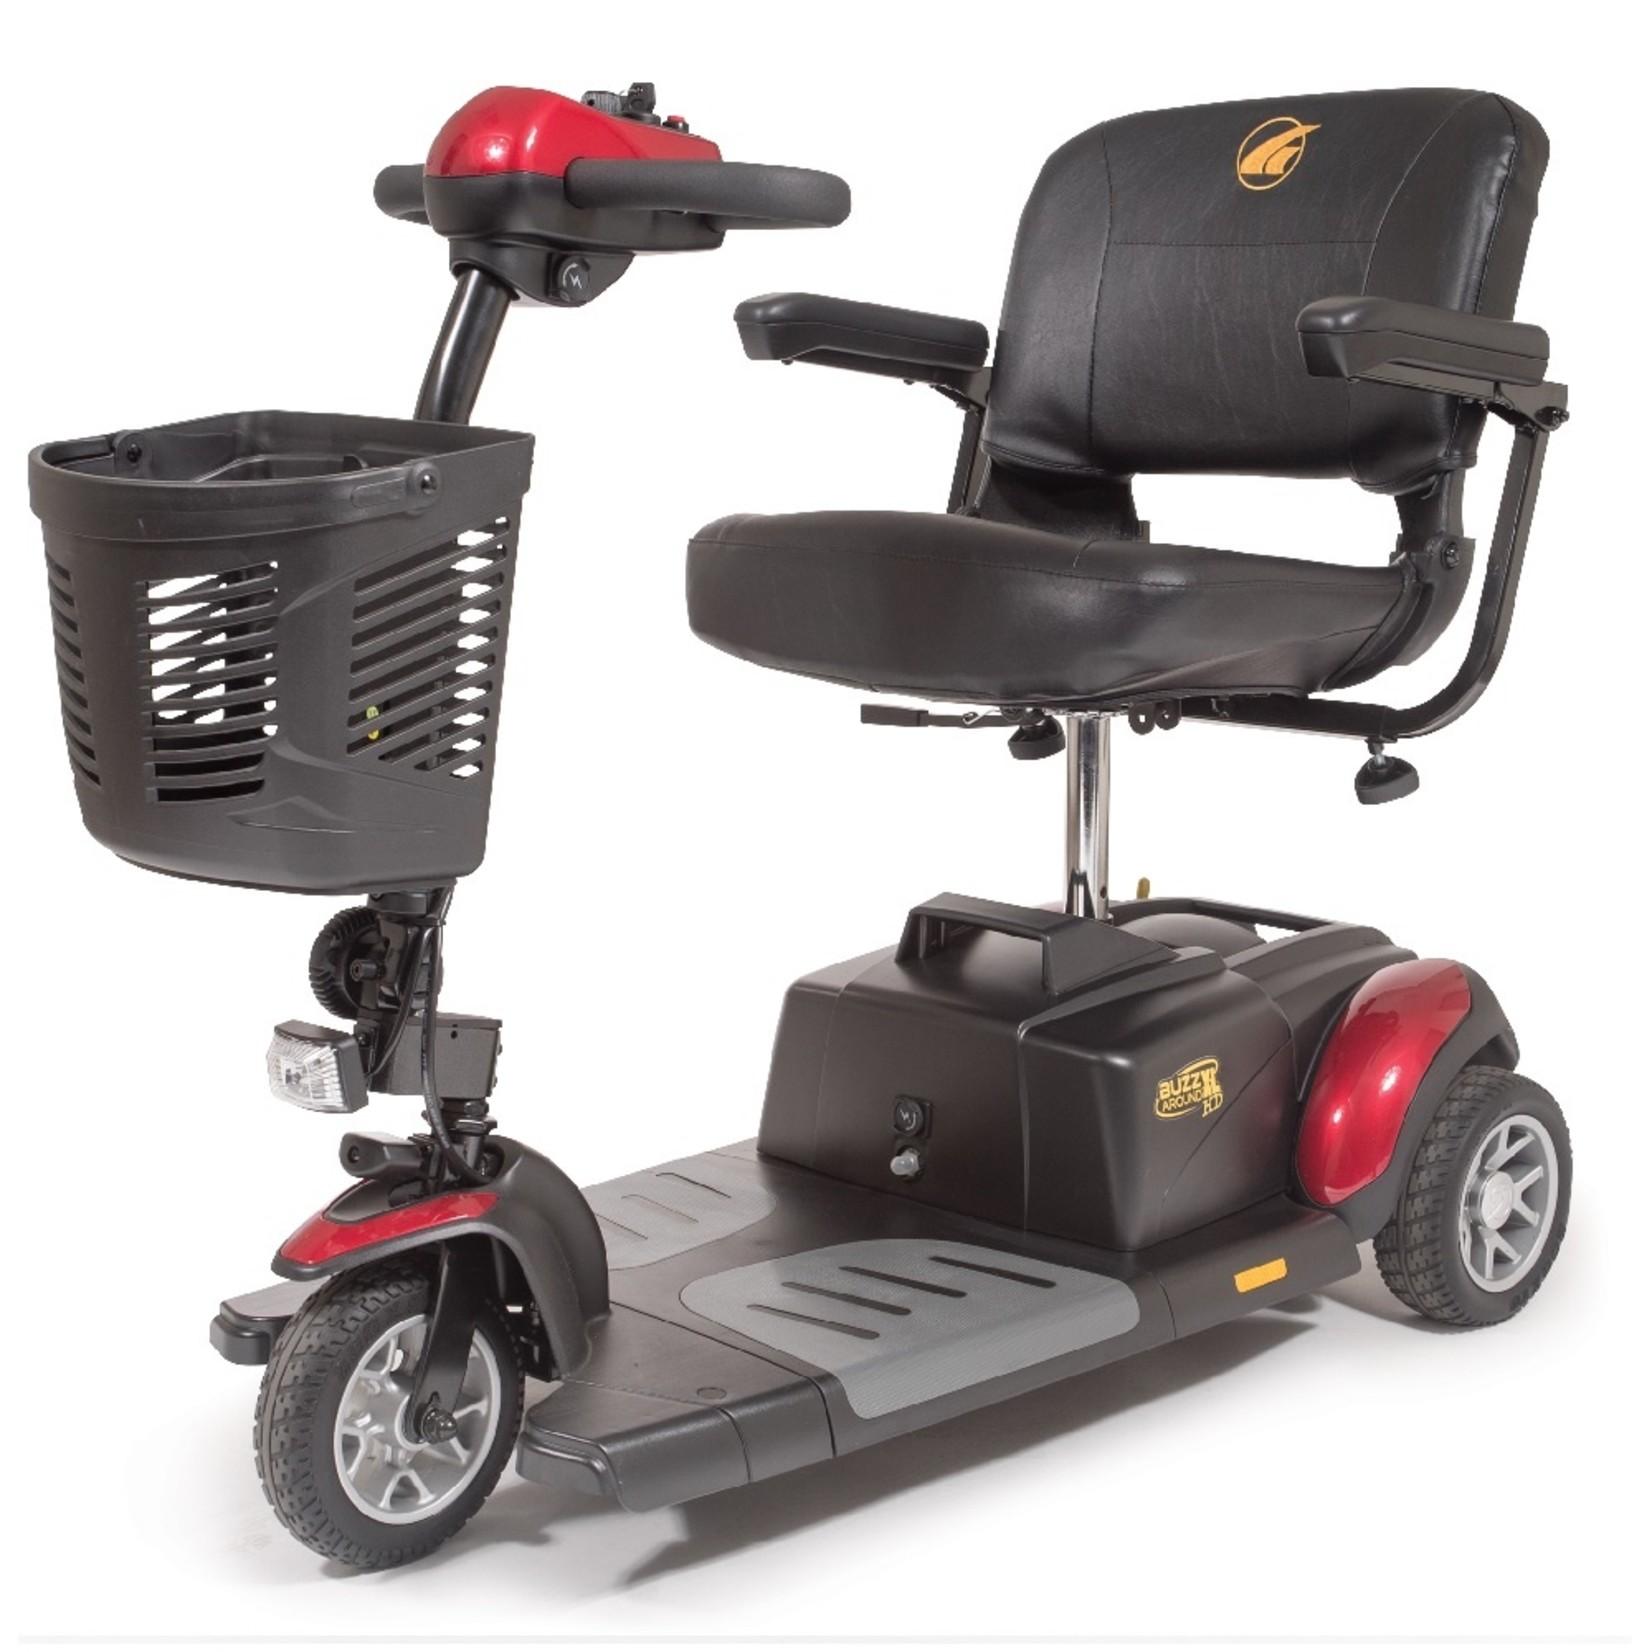 Golden Technologies Buzzaround XL - HD 3-Wheel Scooters